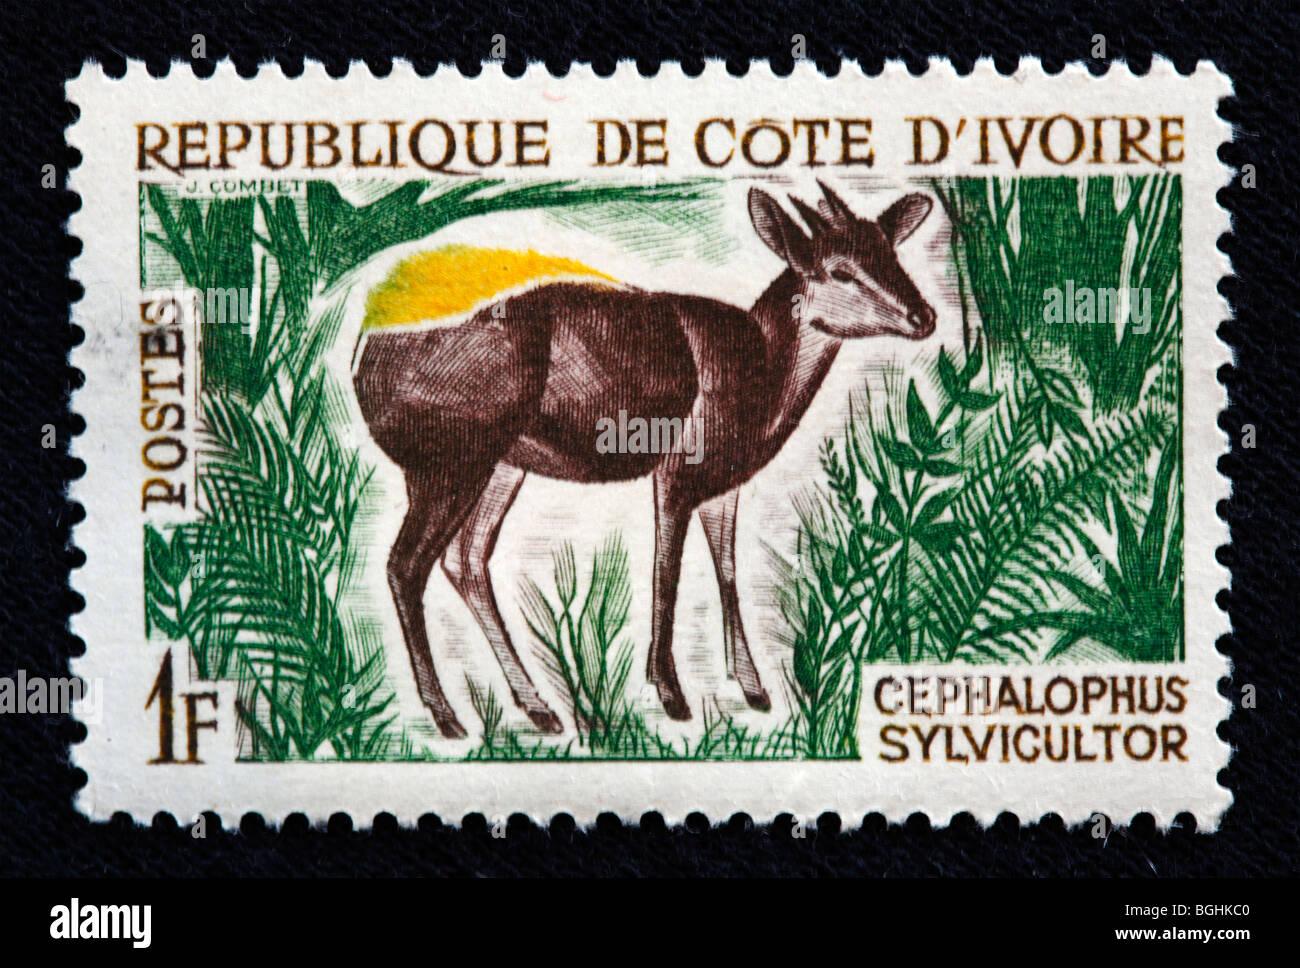 Cephlophus sylvicultor, postage stamp, Cote d'Ivoire, 1970s - Stock Image